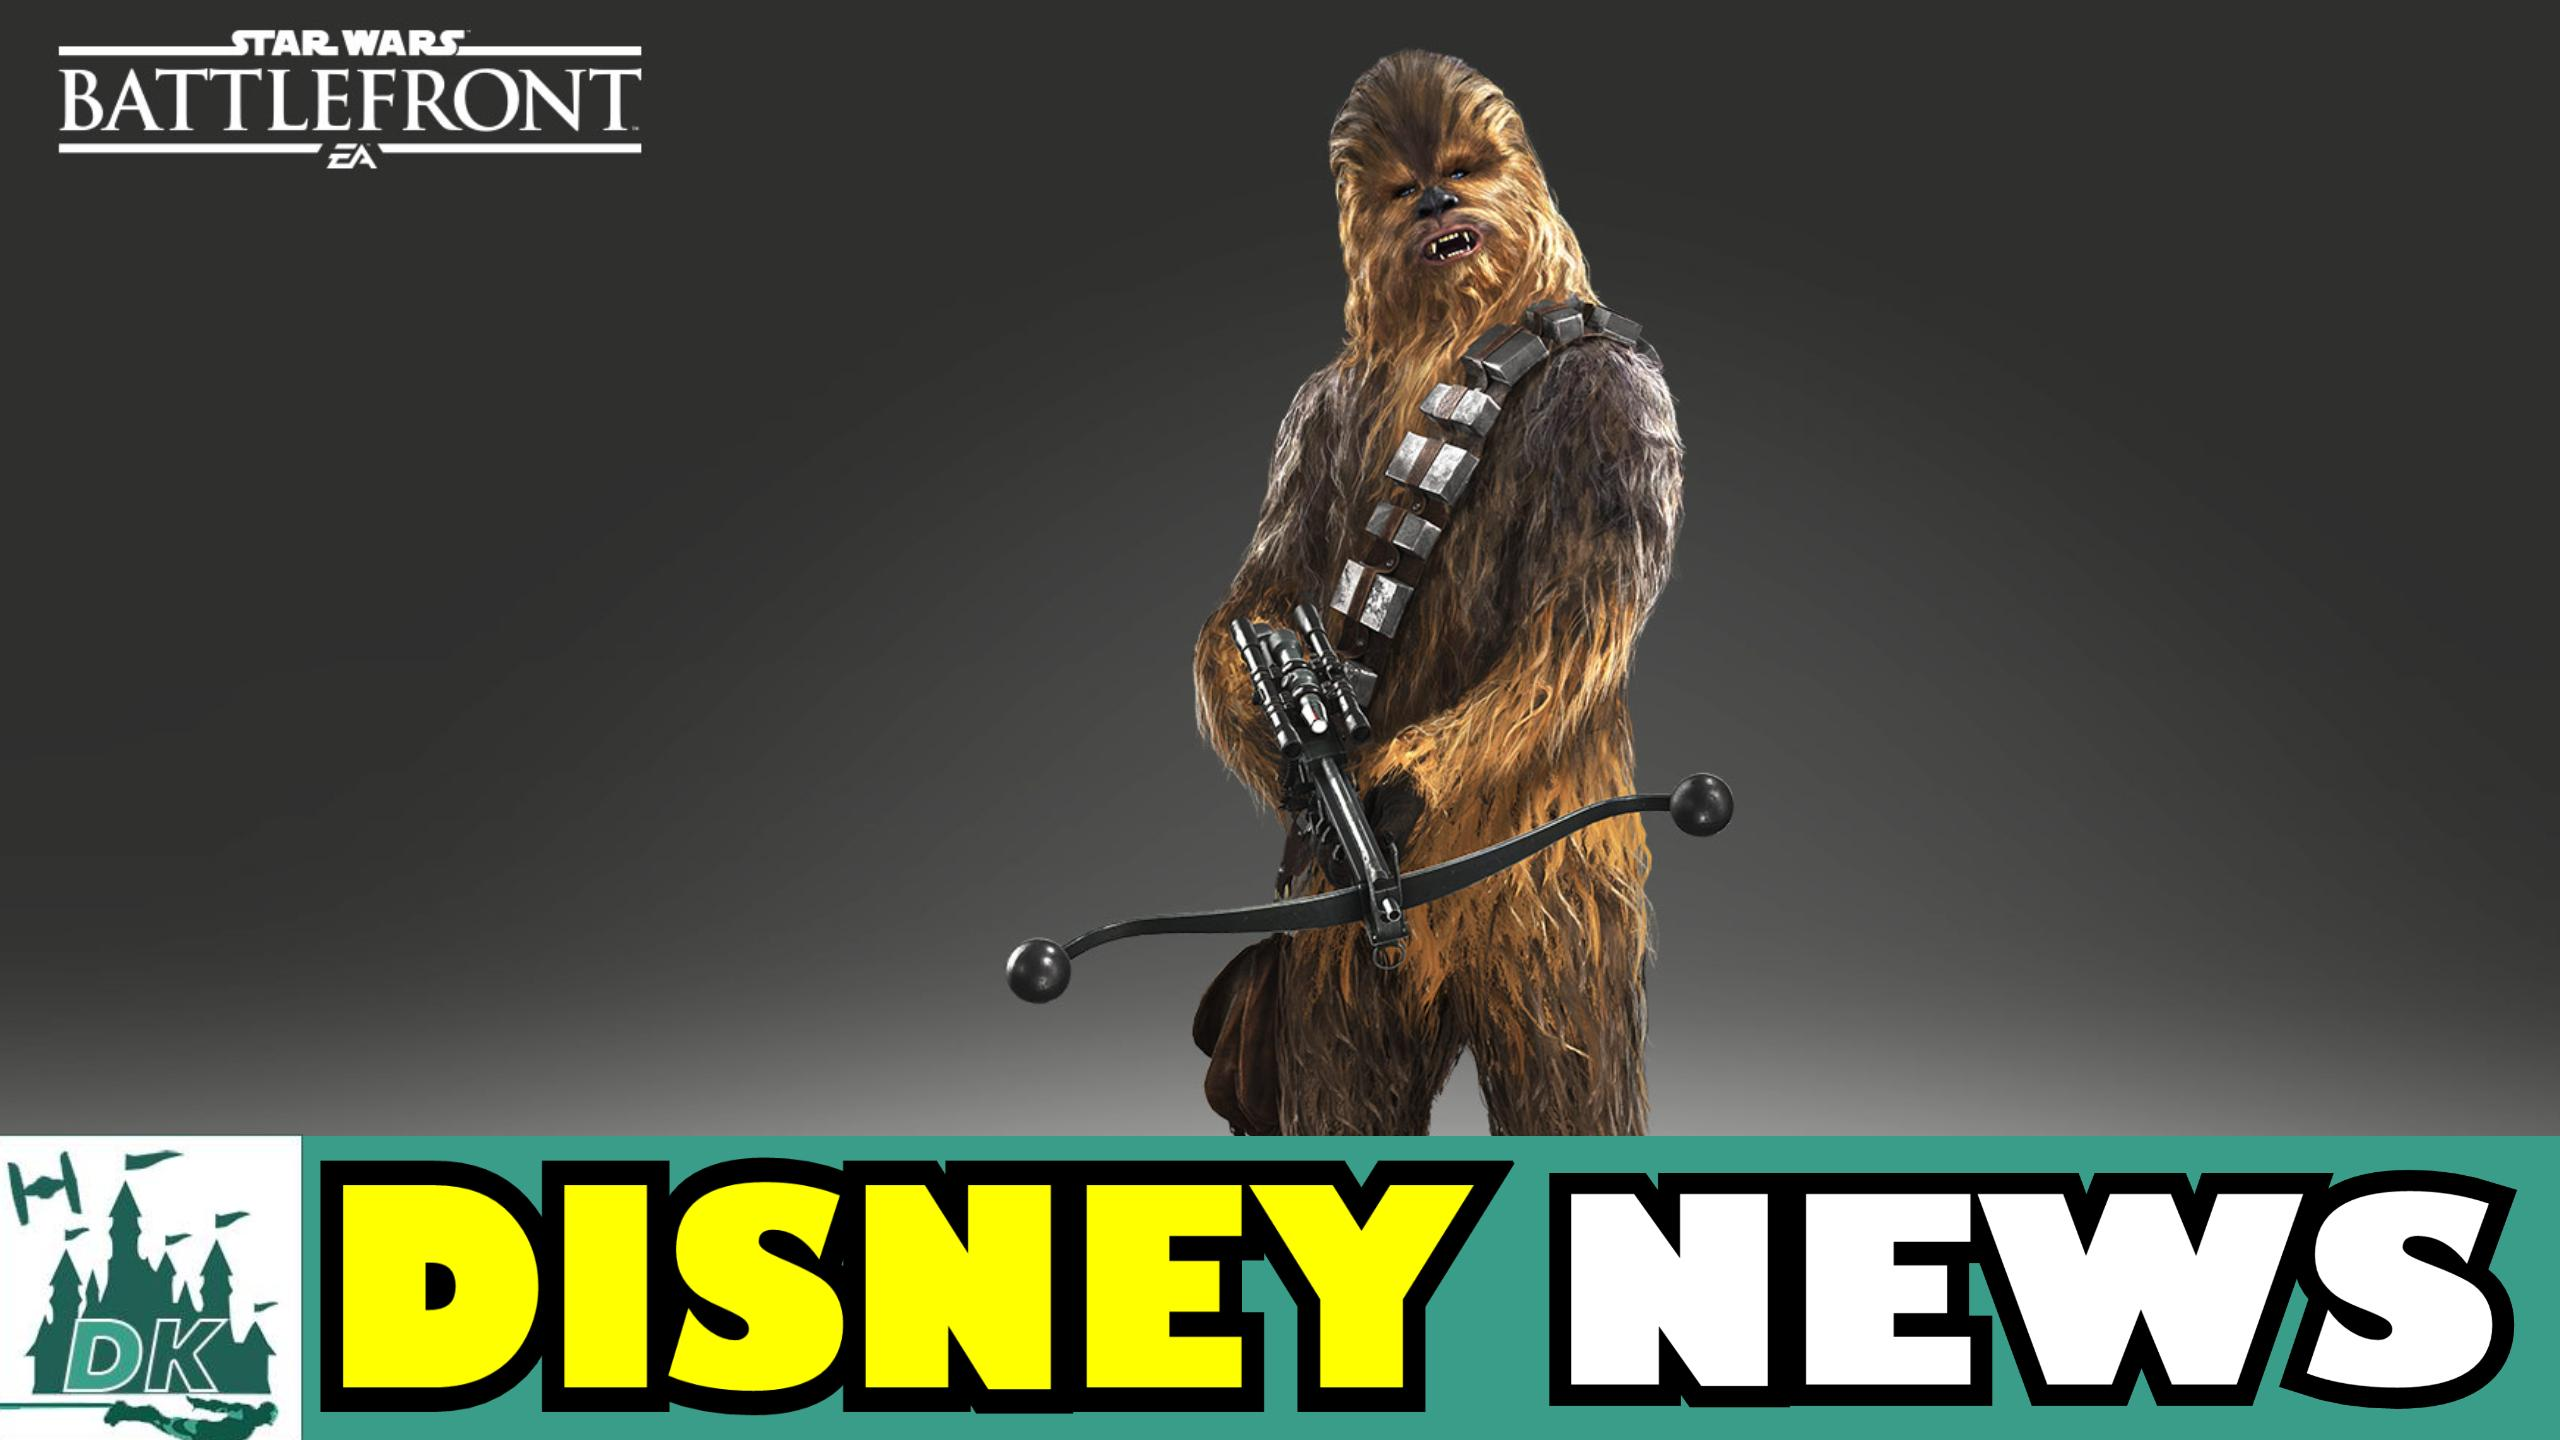 Chewbacca & Bossk In Star Wars Battlefront + More Job Cuts At Disney Interactive | DK Disney News